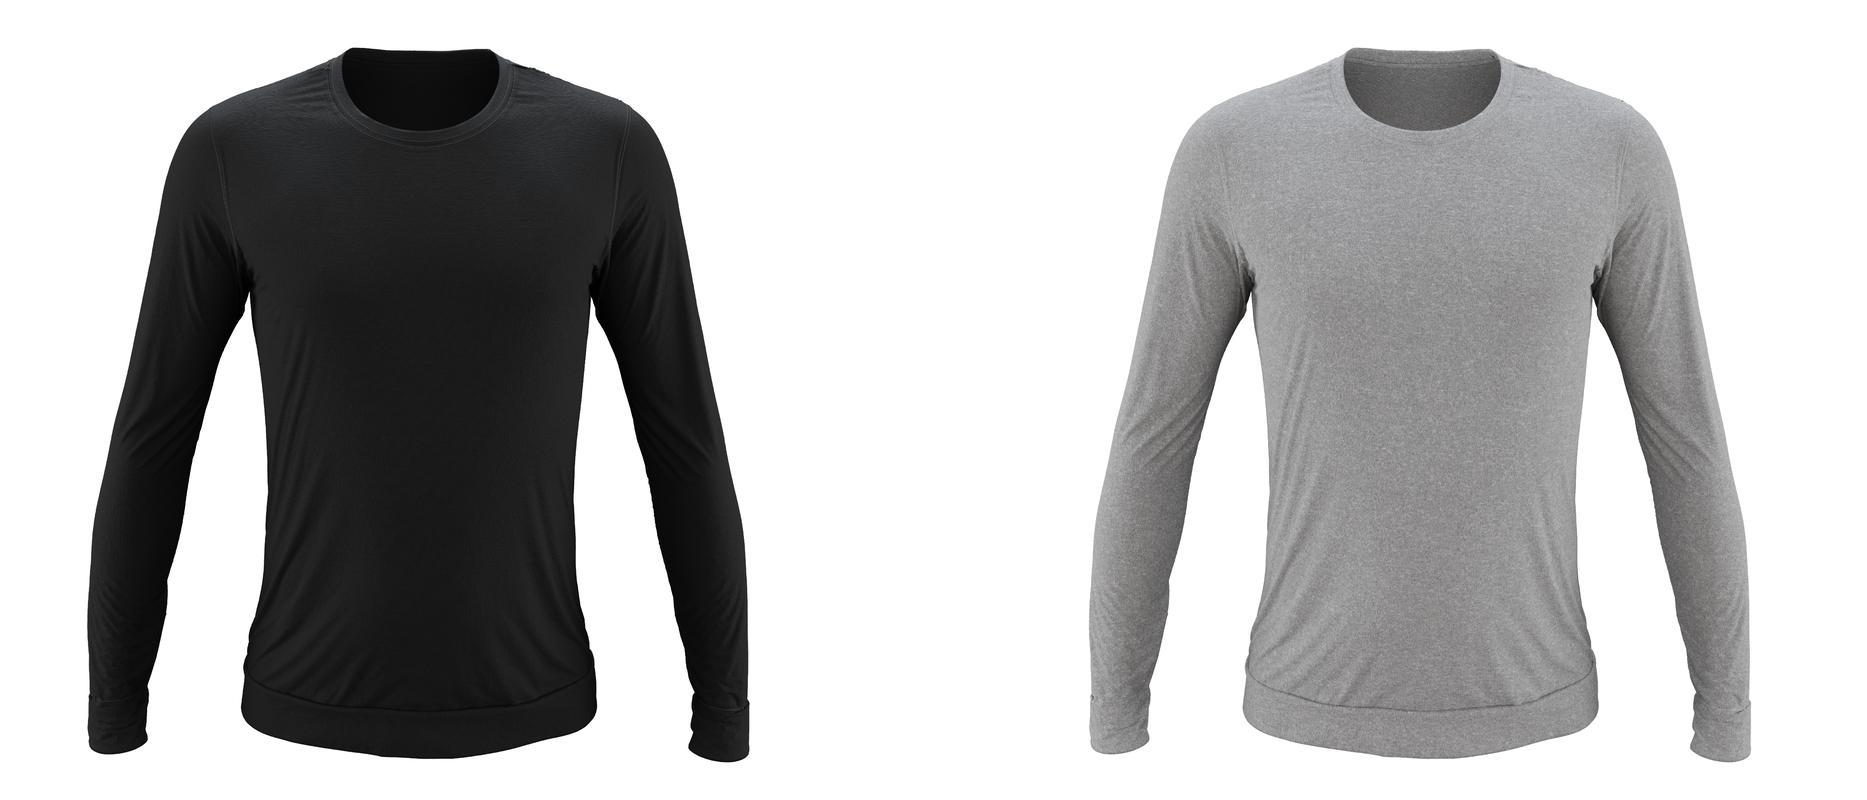 StringKing Apparel Crewneck Sweatshirt Black Heather Gray